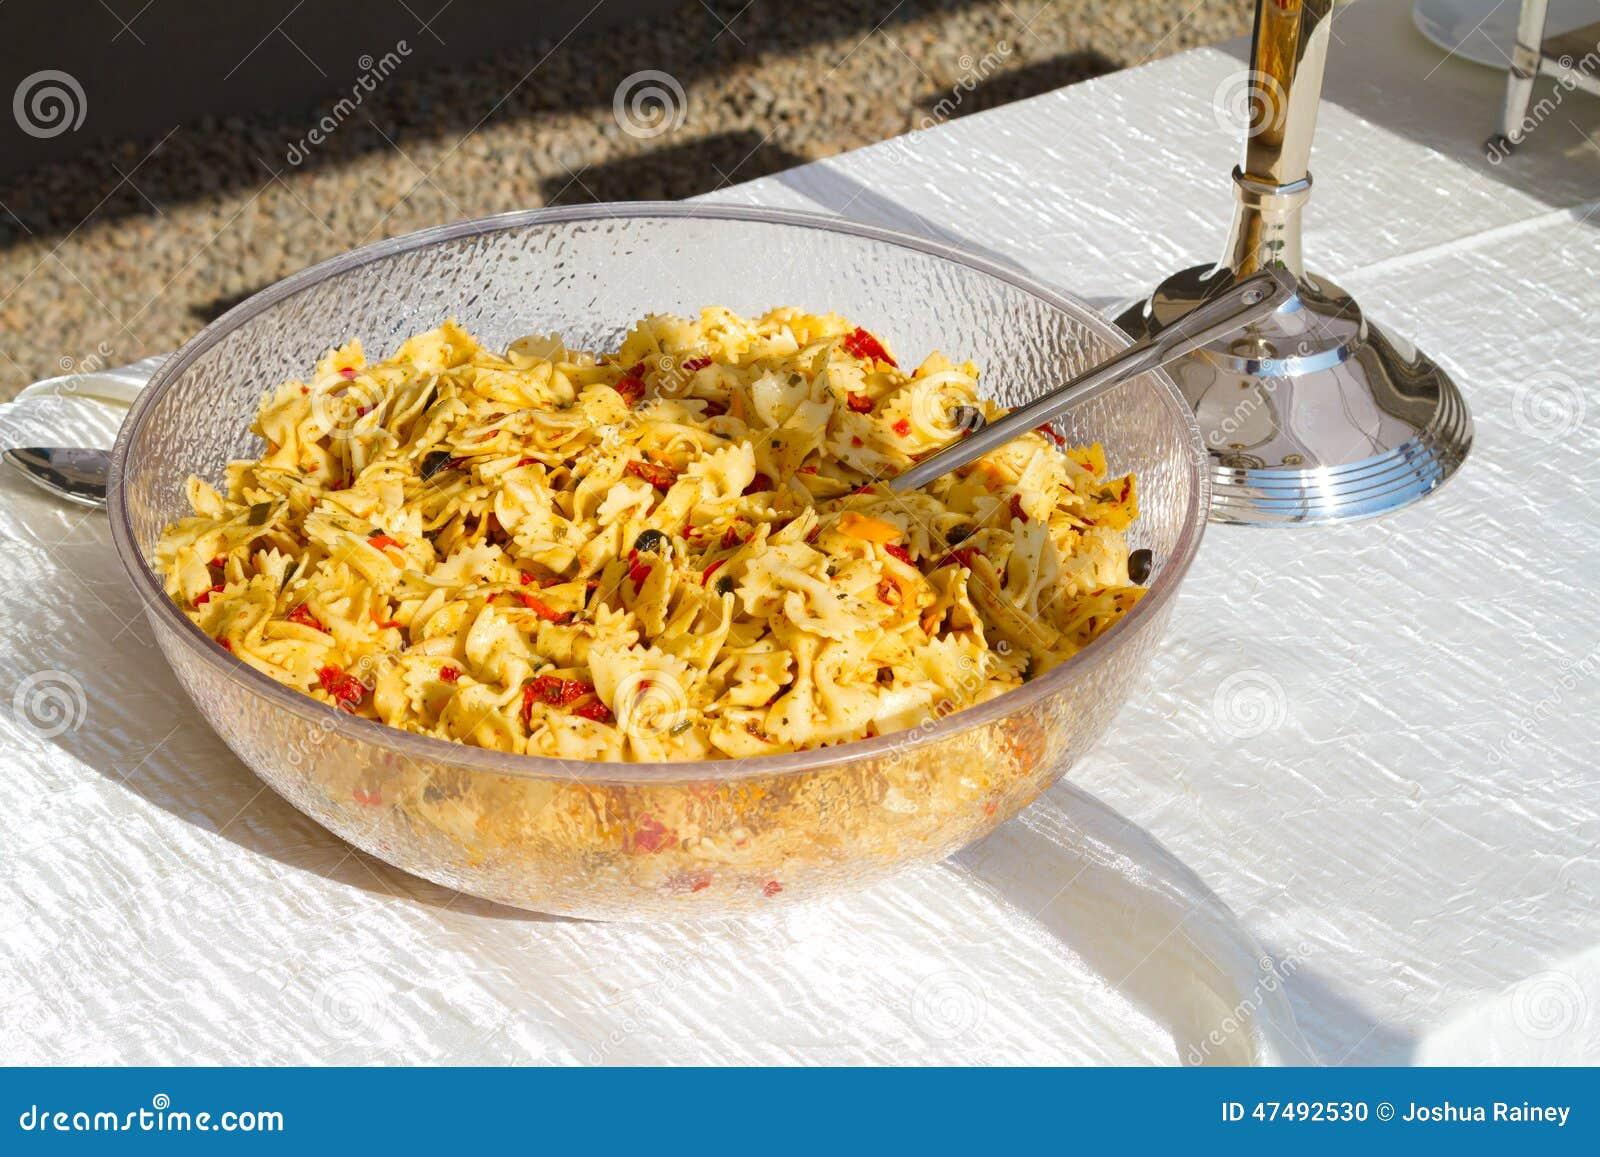 Wedding Reception Pasta Salad Stock Photo Image Of Food Lunch